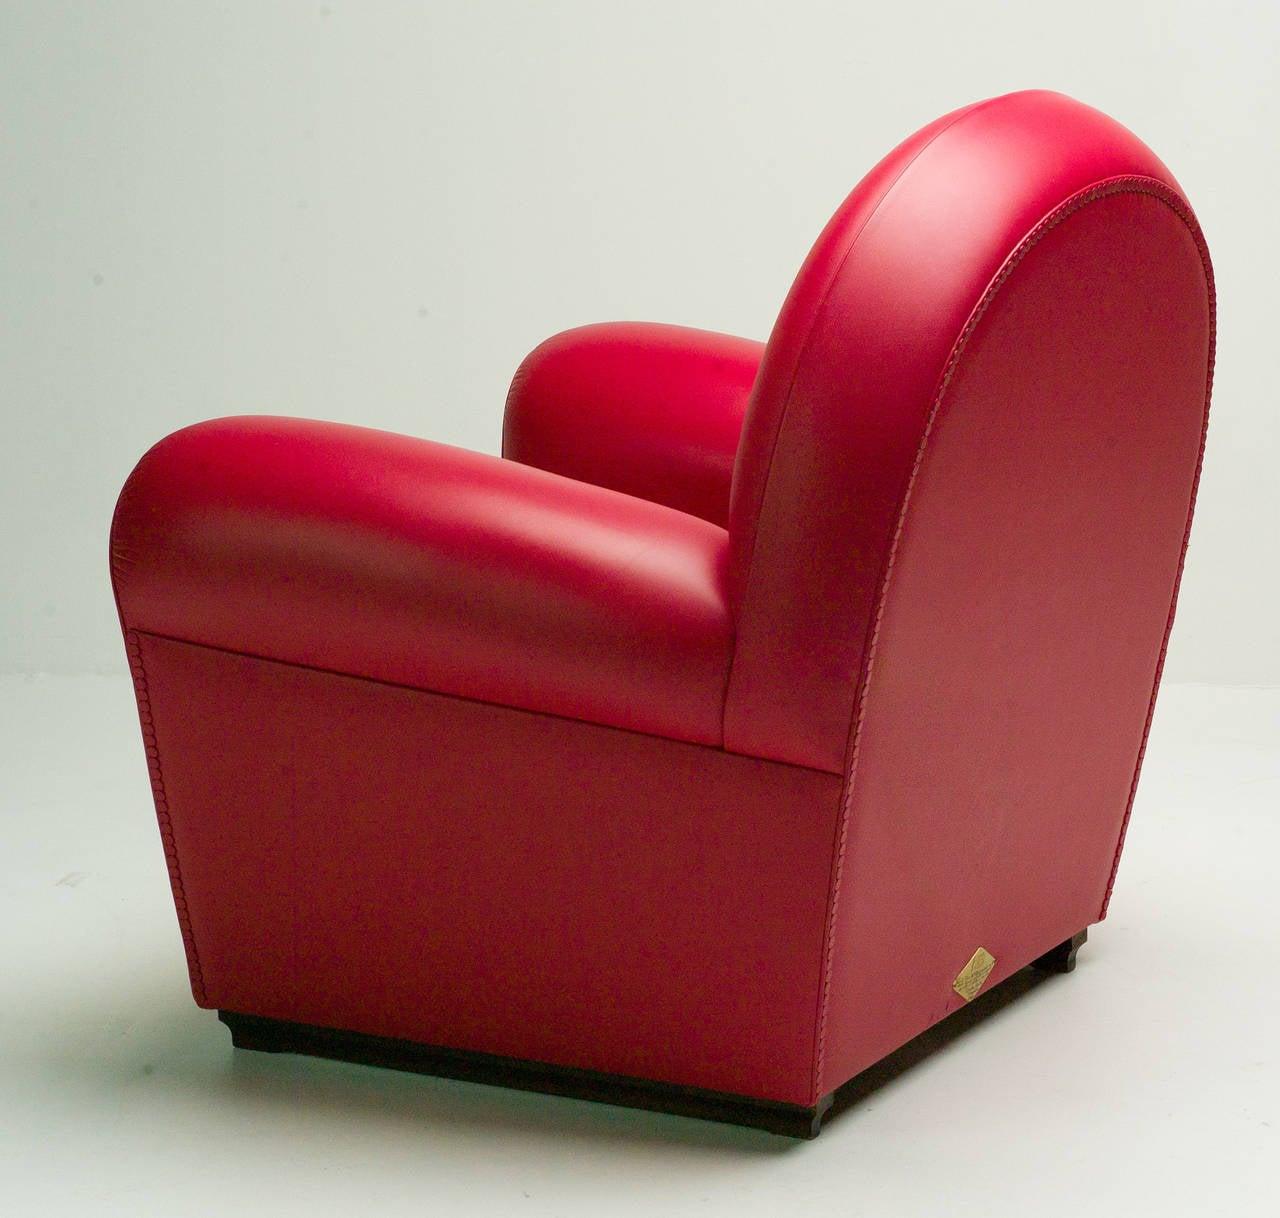 Poltrona Frau Vanity Fair Armchair by Renzo Frau For Sale at 1stdibs